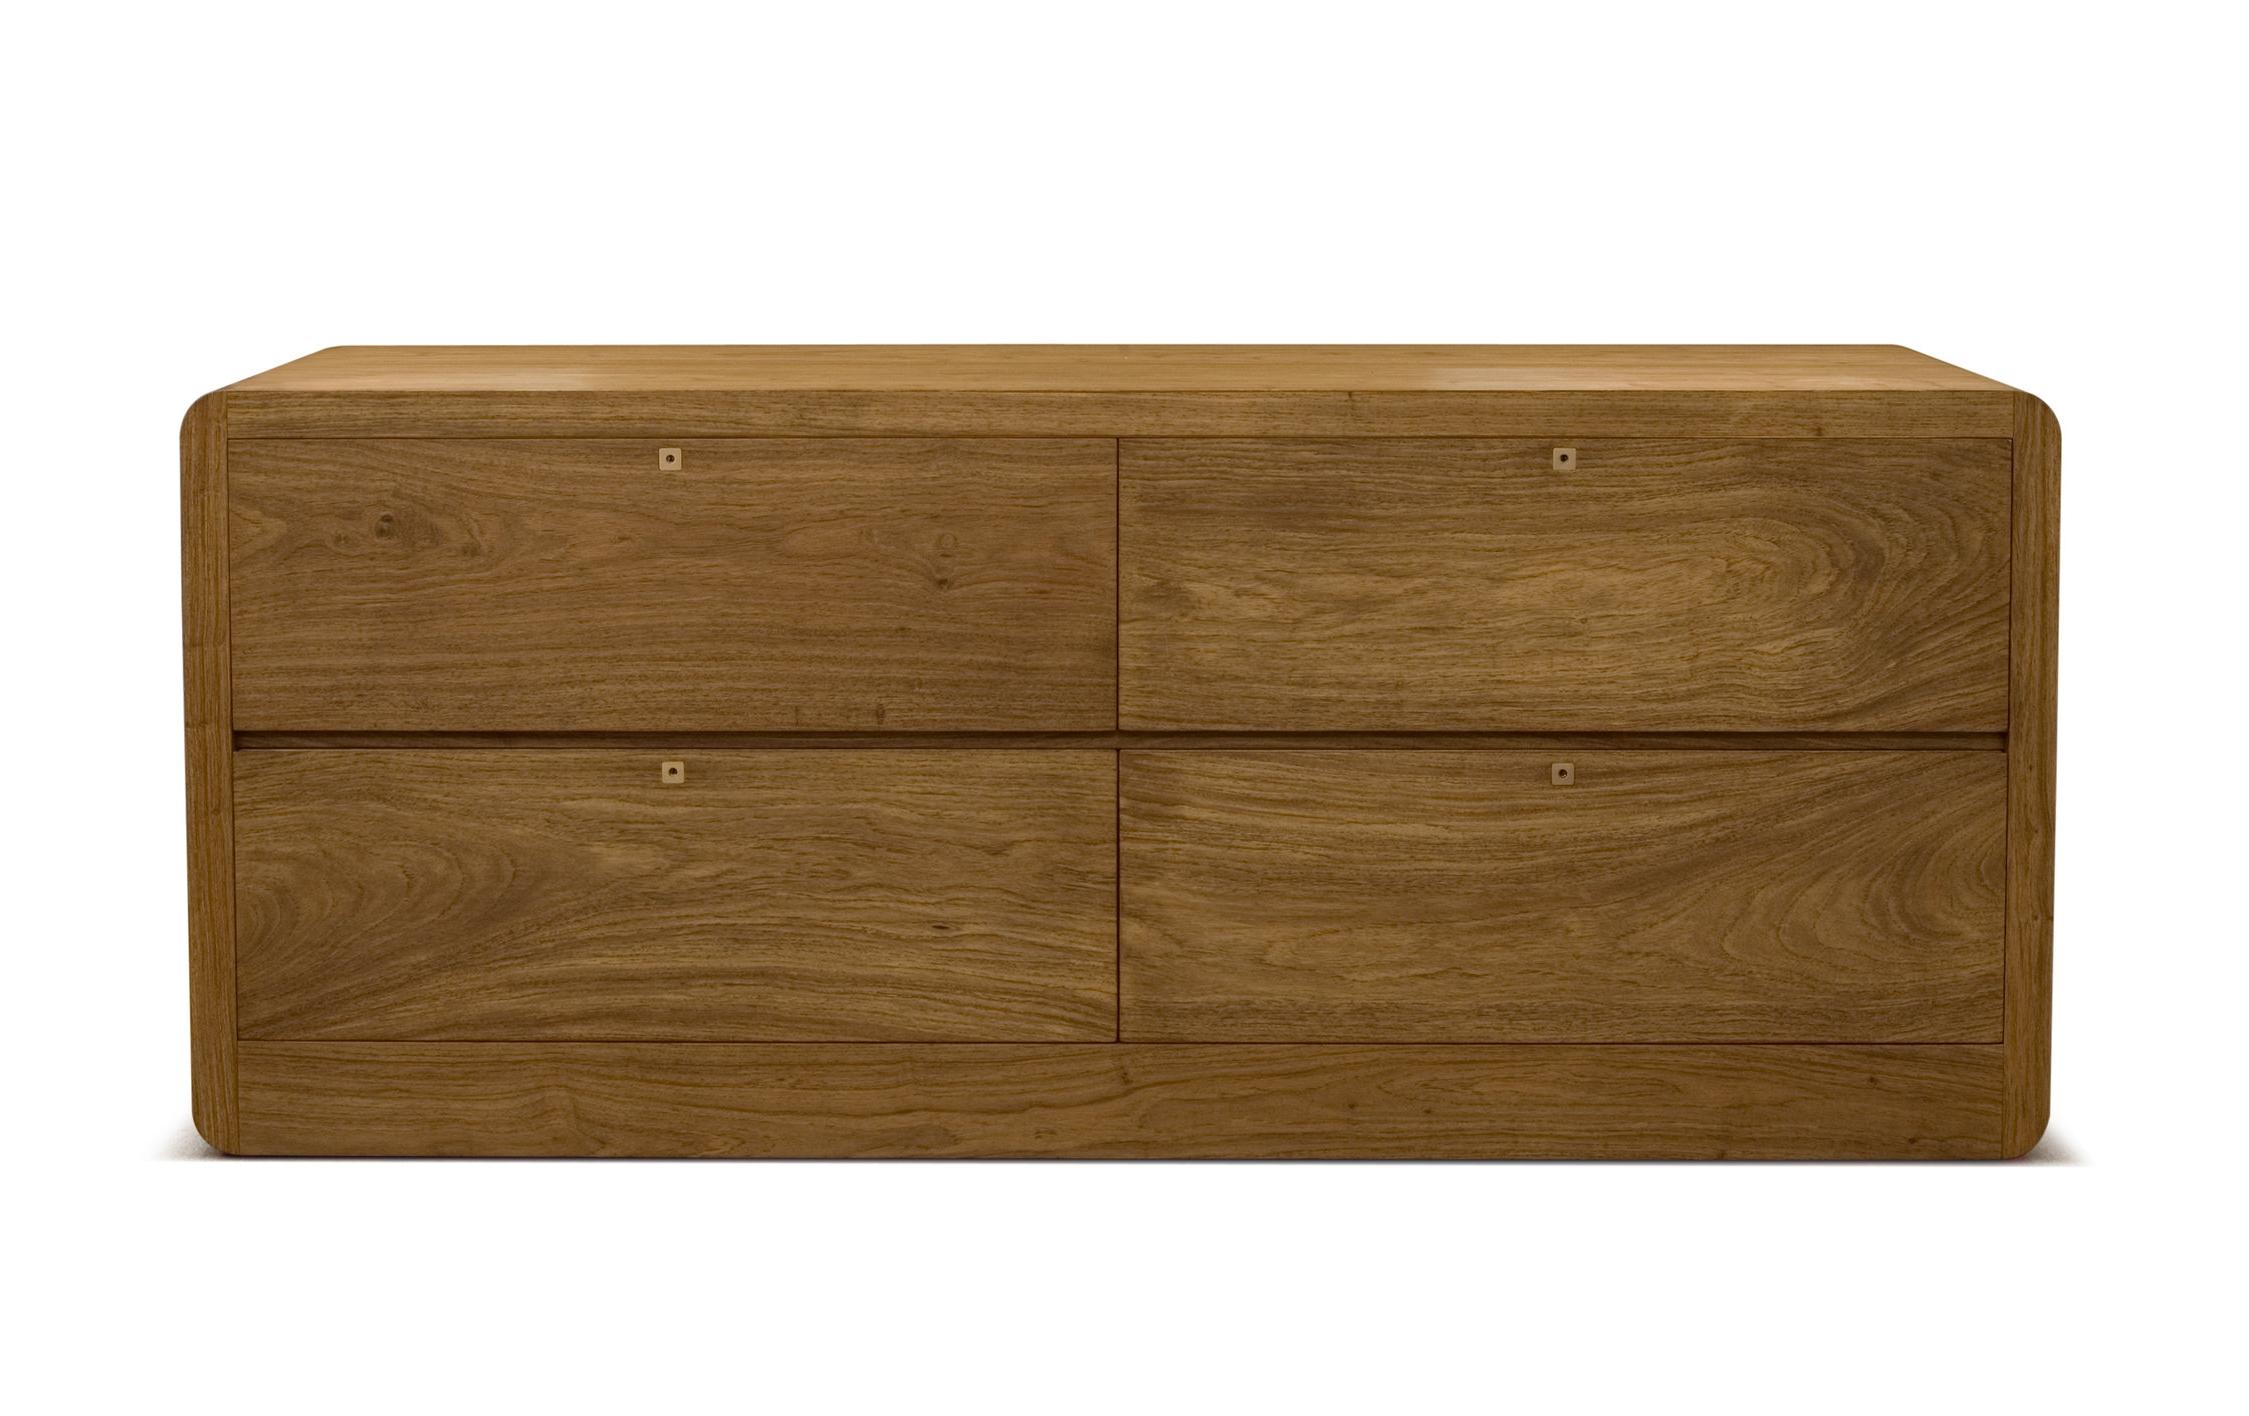 ....Custom made Modern furniture : Filing cabinet..特别定制現代家具:文件柜....